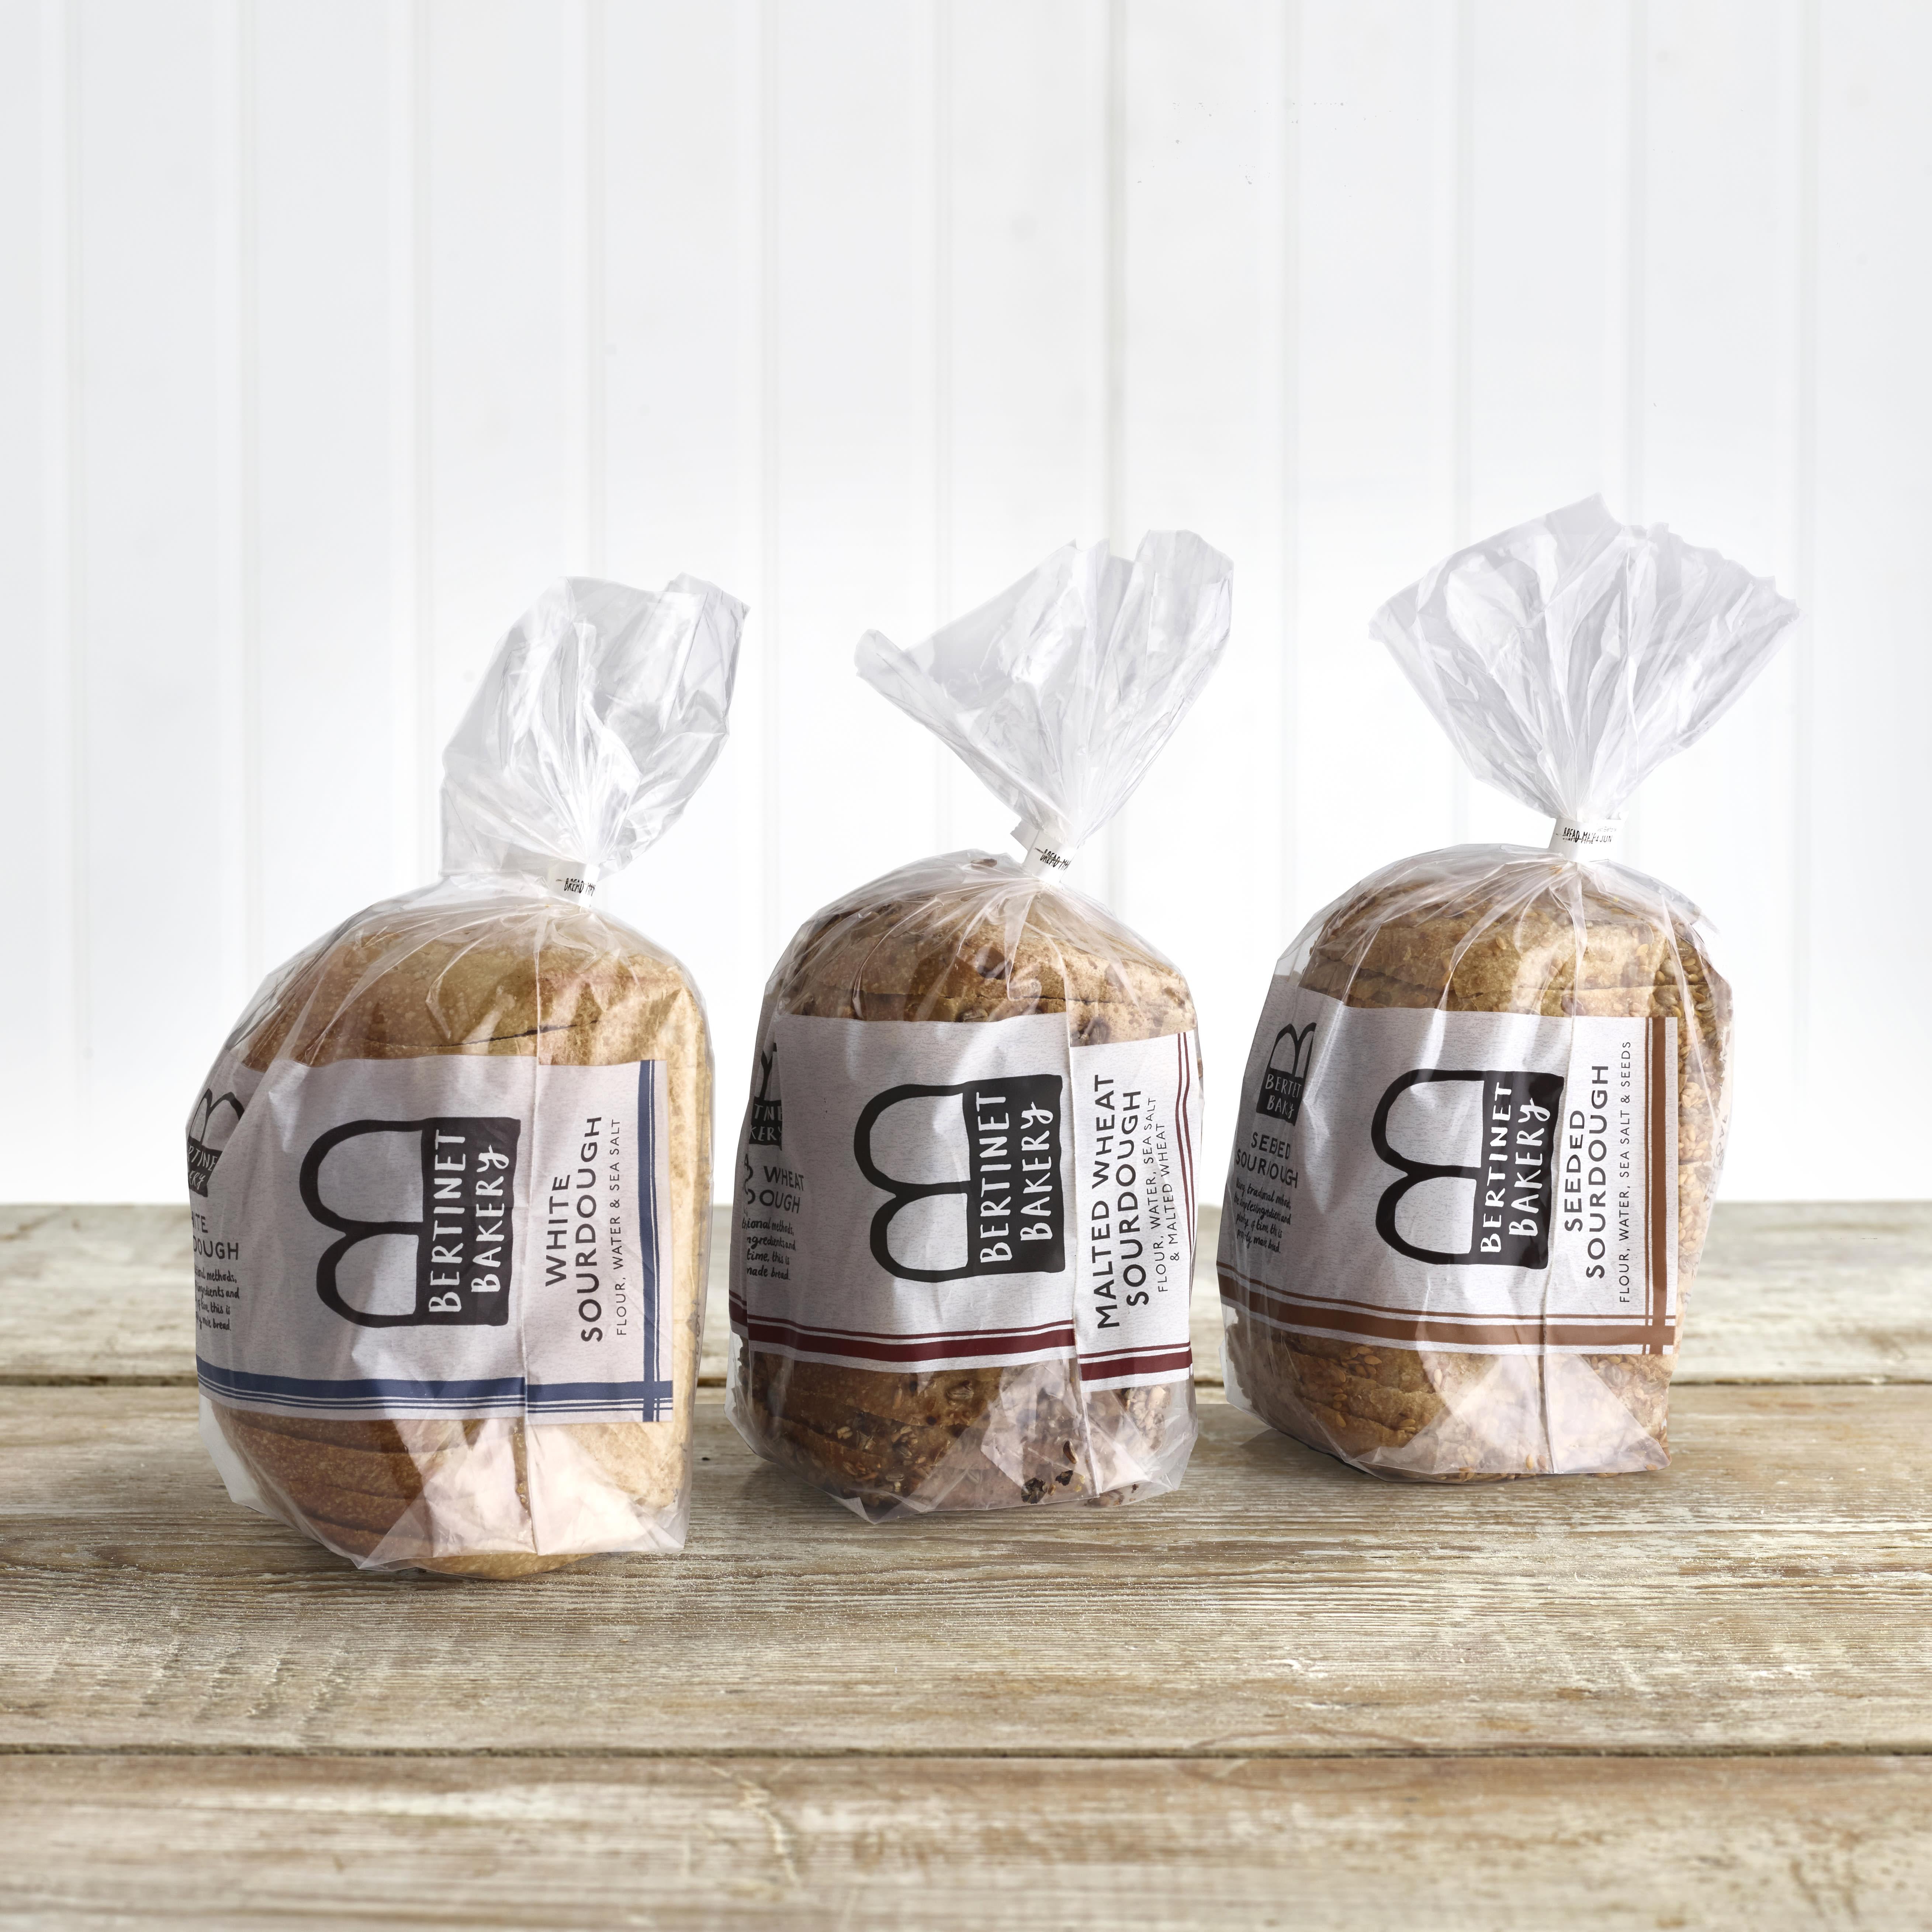 Bertinet Bakery Malted Wheat Sourdough, 500g